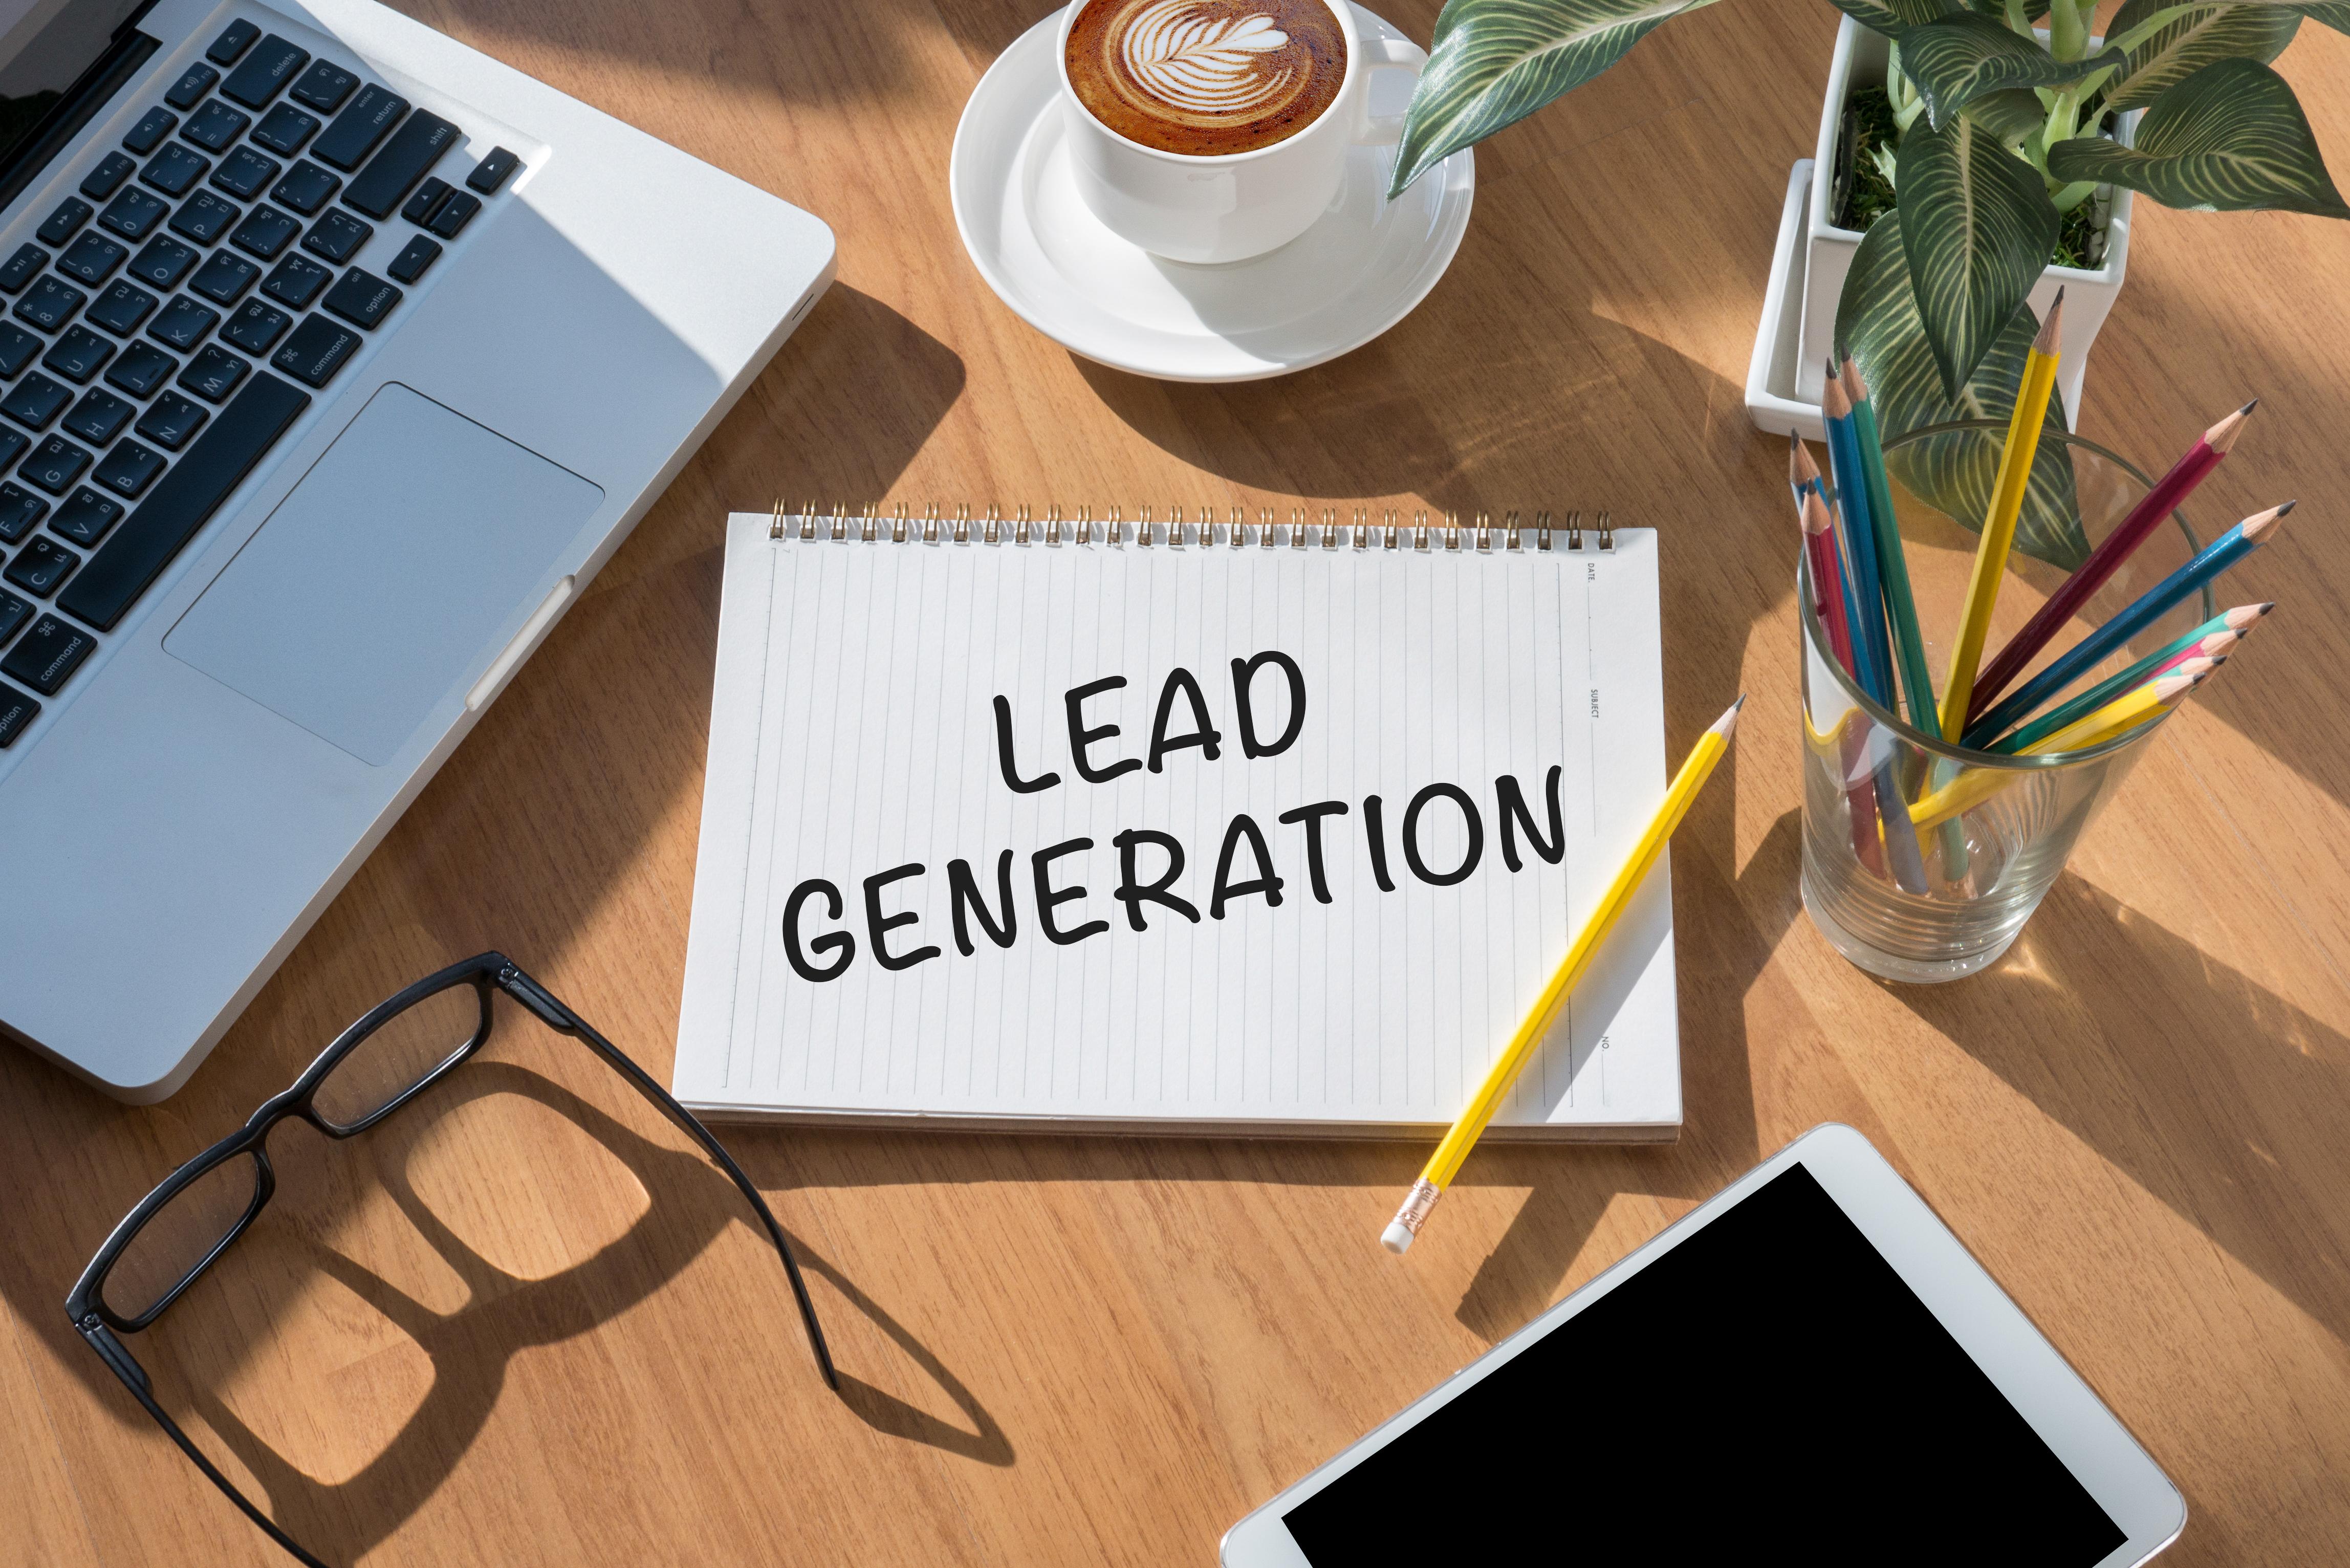 email marketing - lead generation